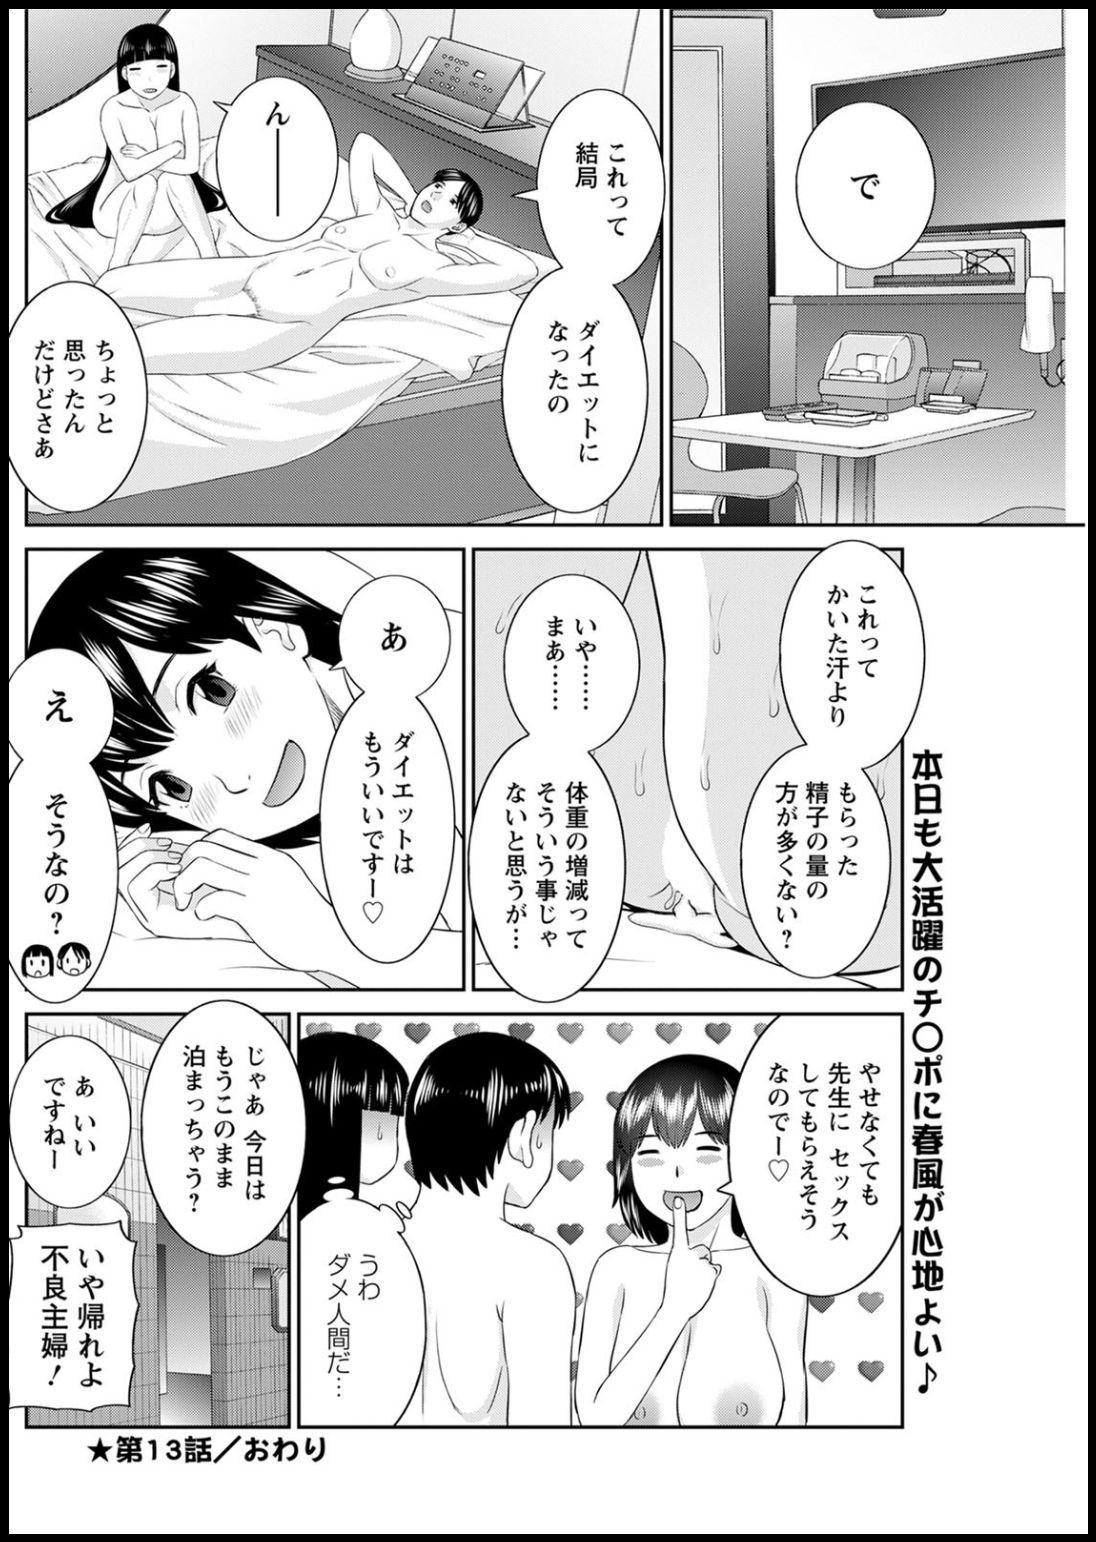 [Kawamori Misaki] Kaikan Hitotsuma Gakuen Ch. 1-6, 8-20 [Digital] 220